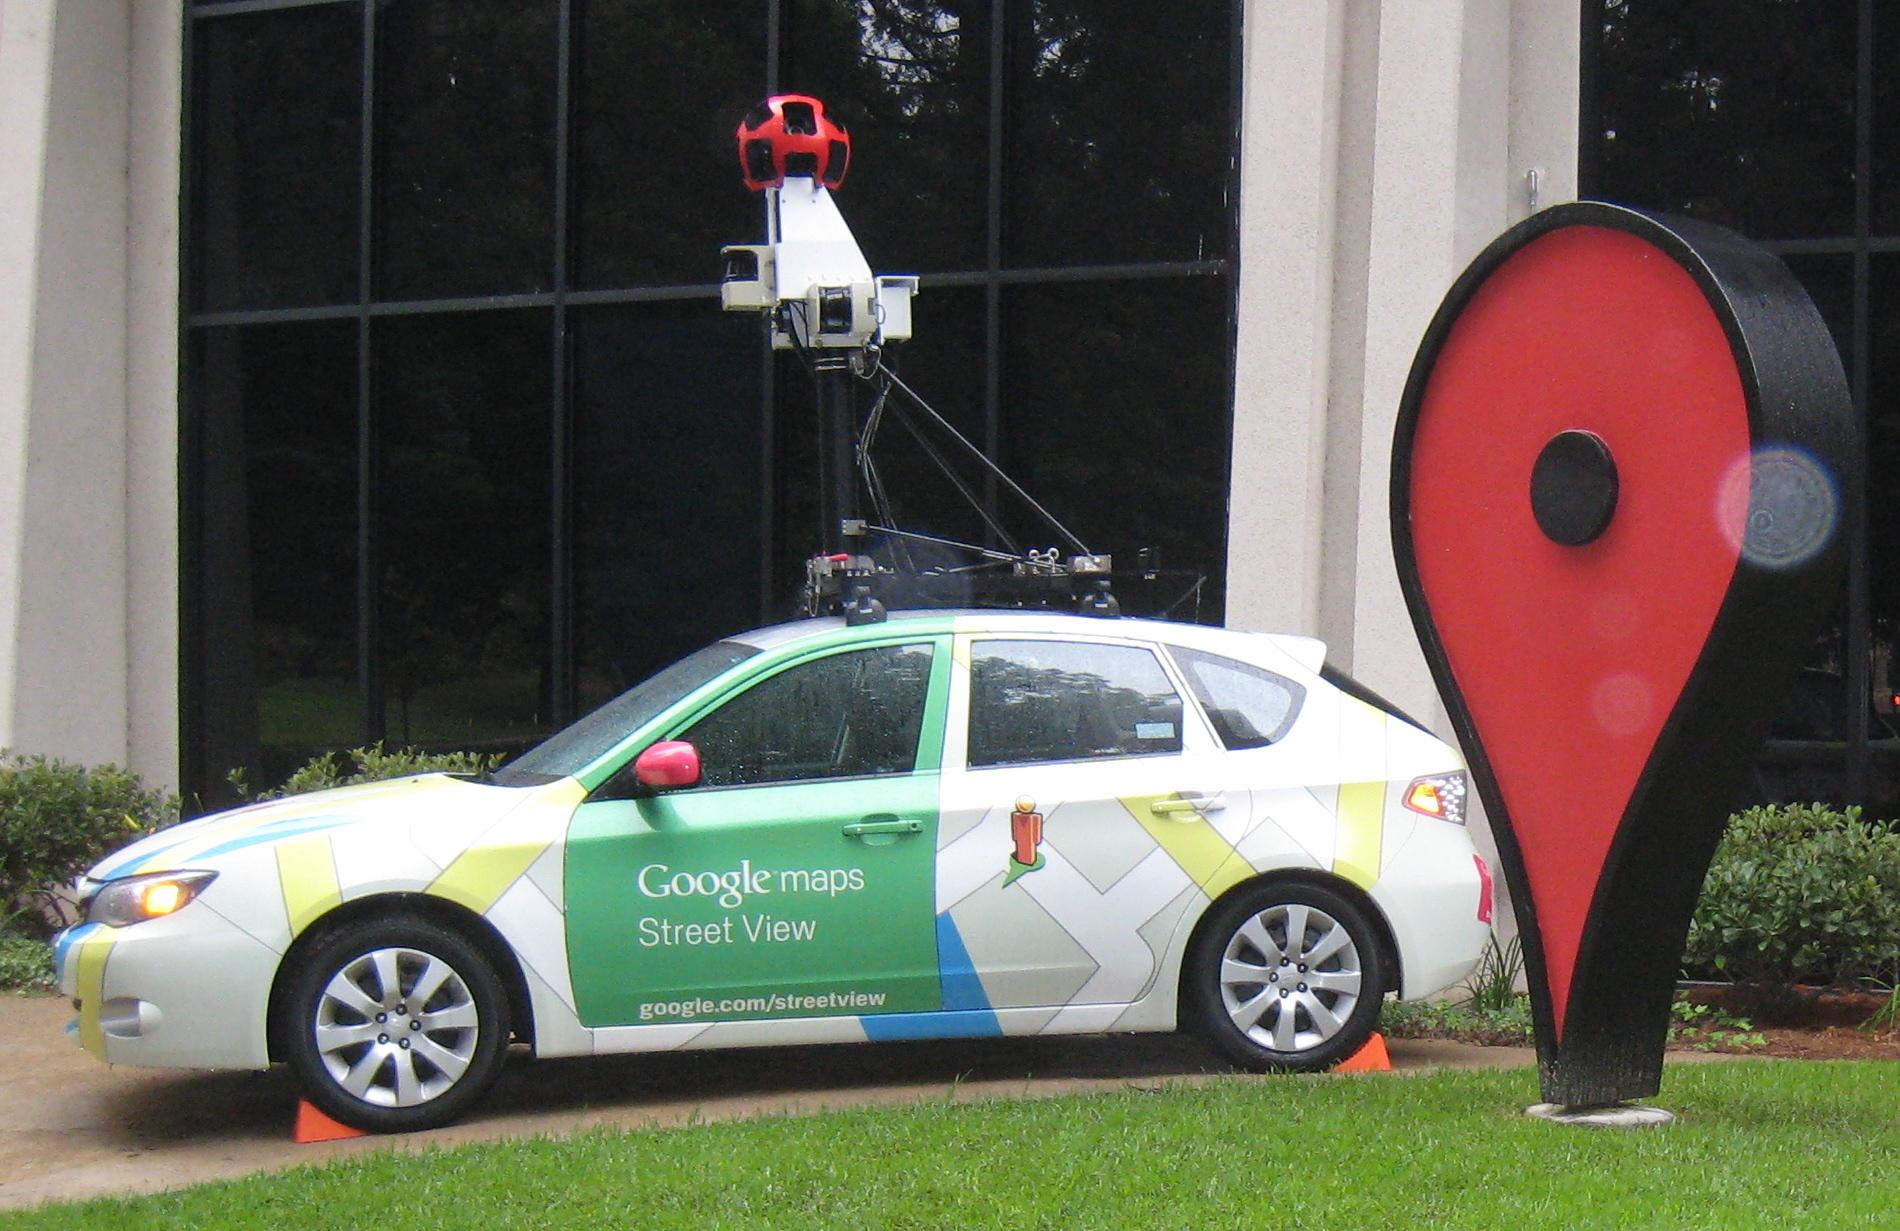 GoogleStreetViewCar_Subaru_Impreza_at_Google_Campus-2.jpg